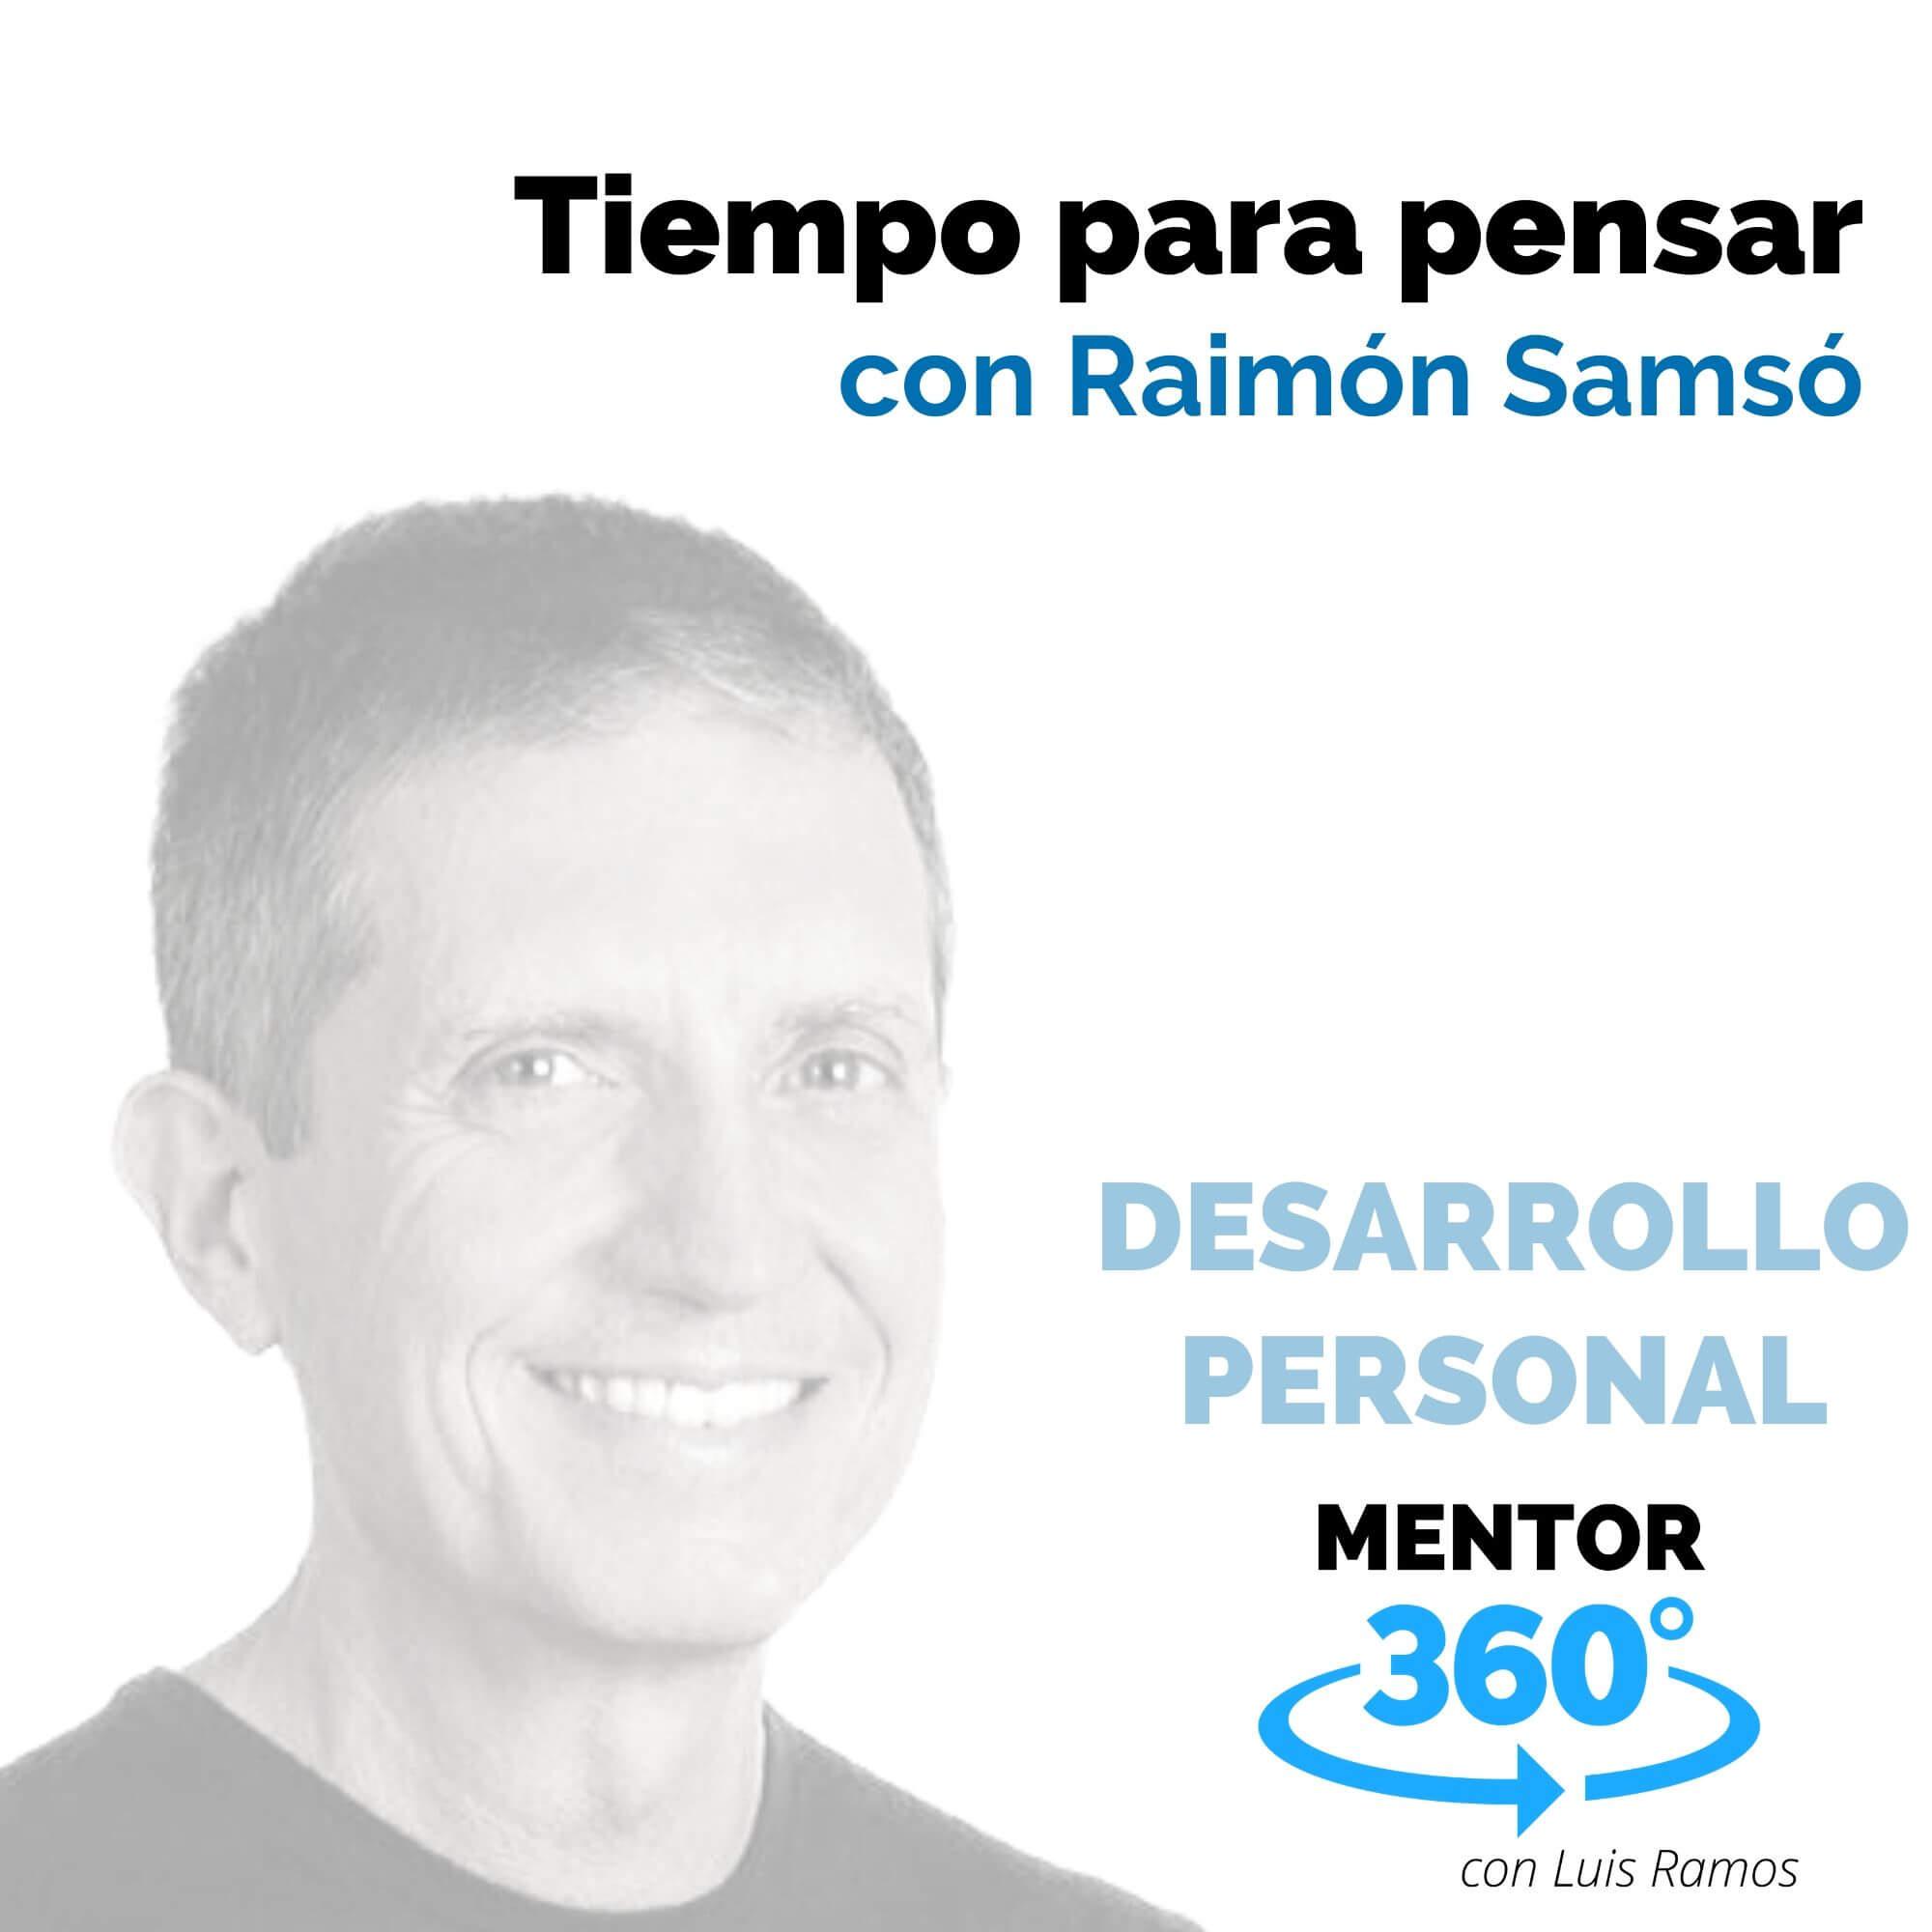 Tiempo para pensar, con Raimón Samsó - DESARROLLO PERSONAL